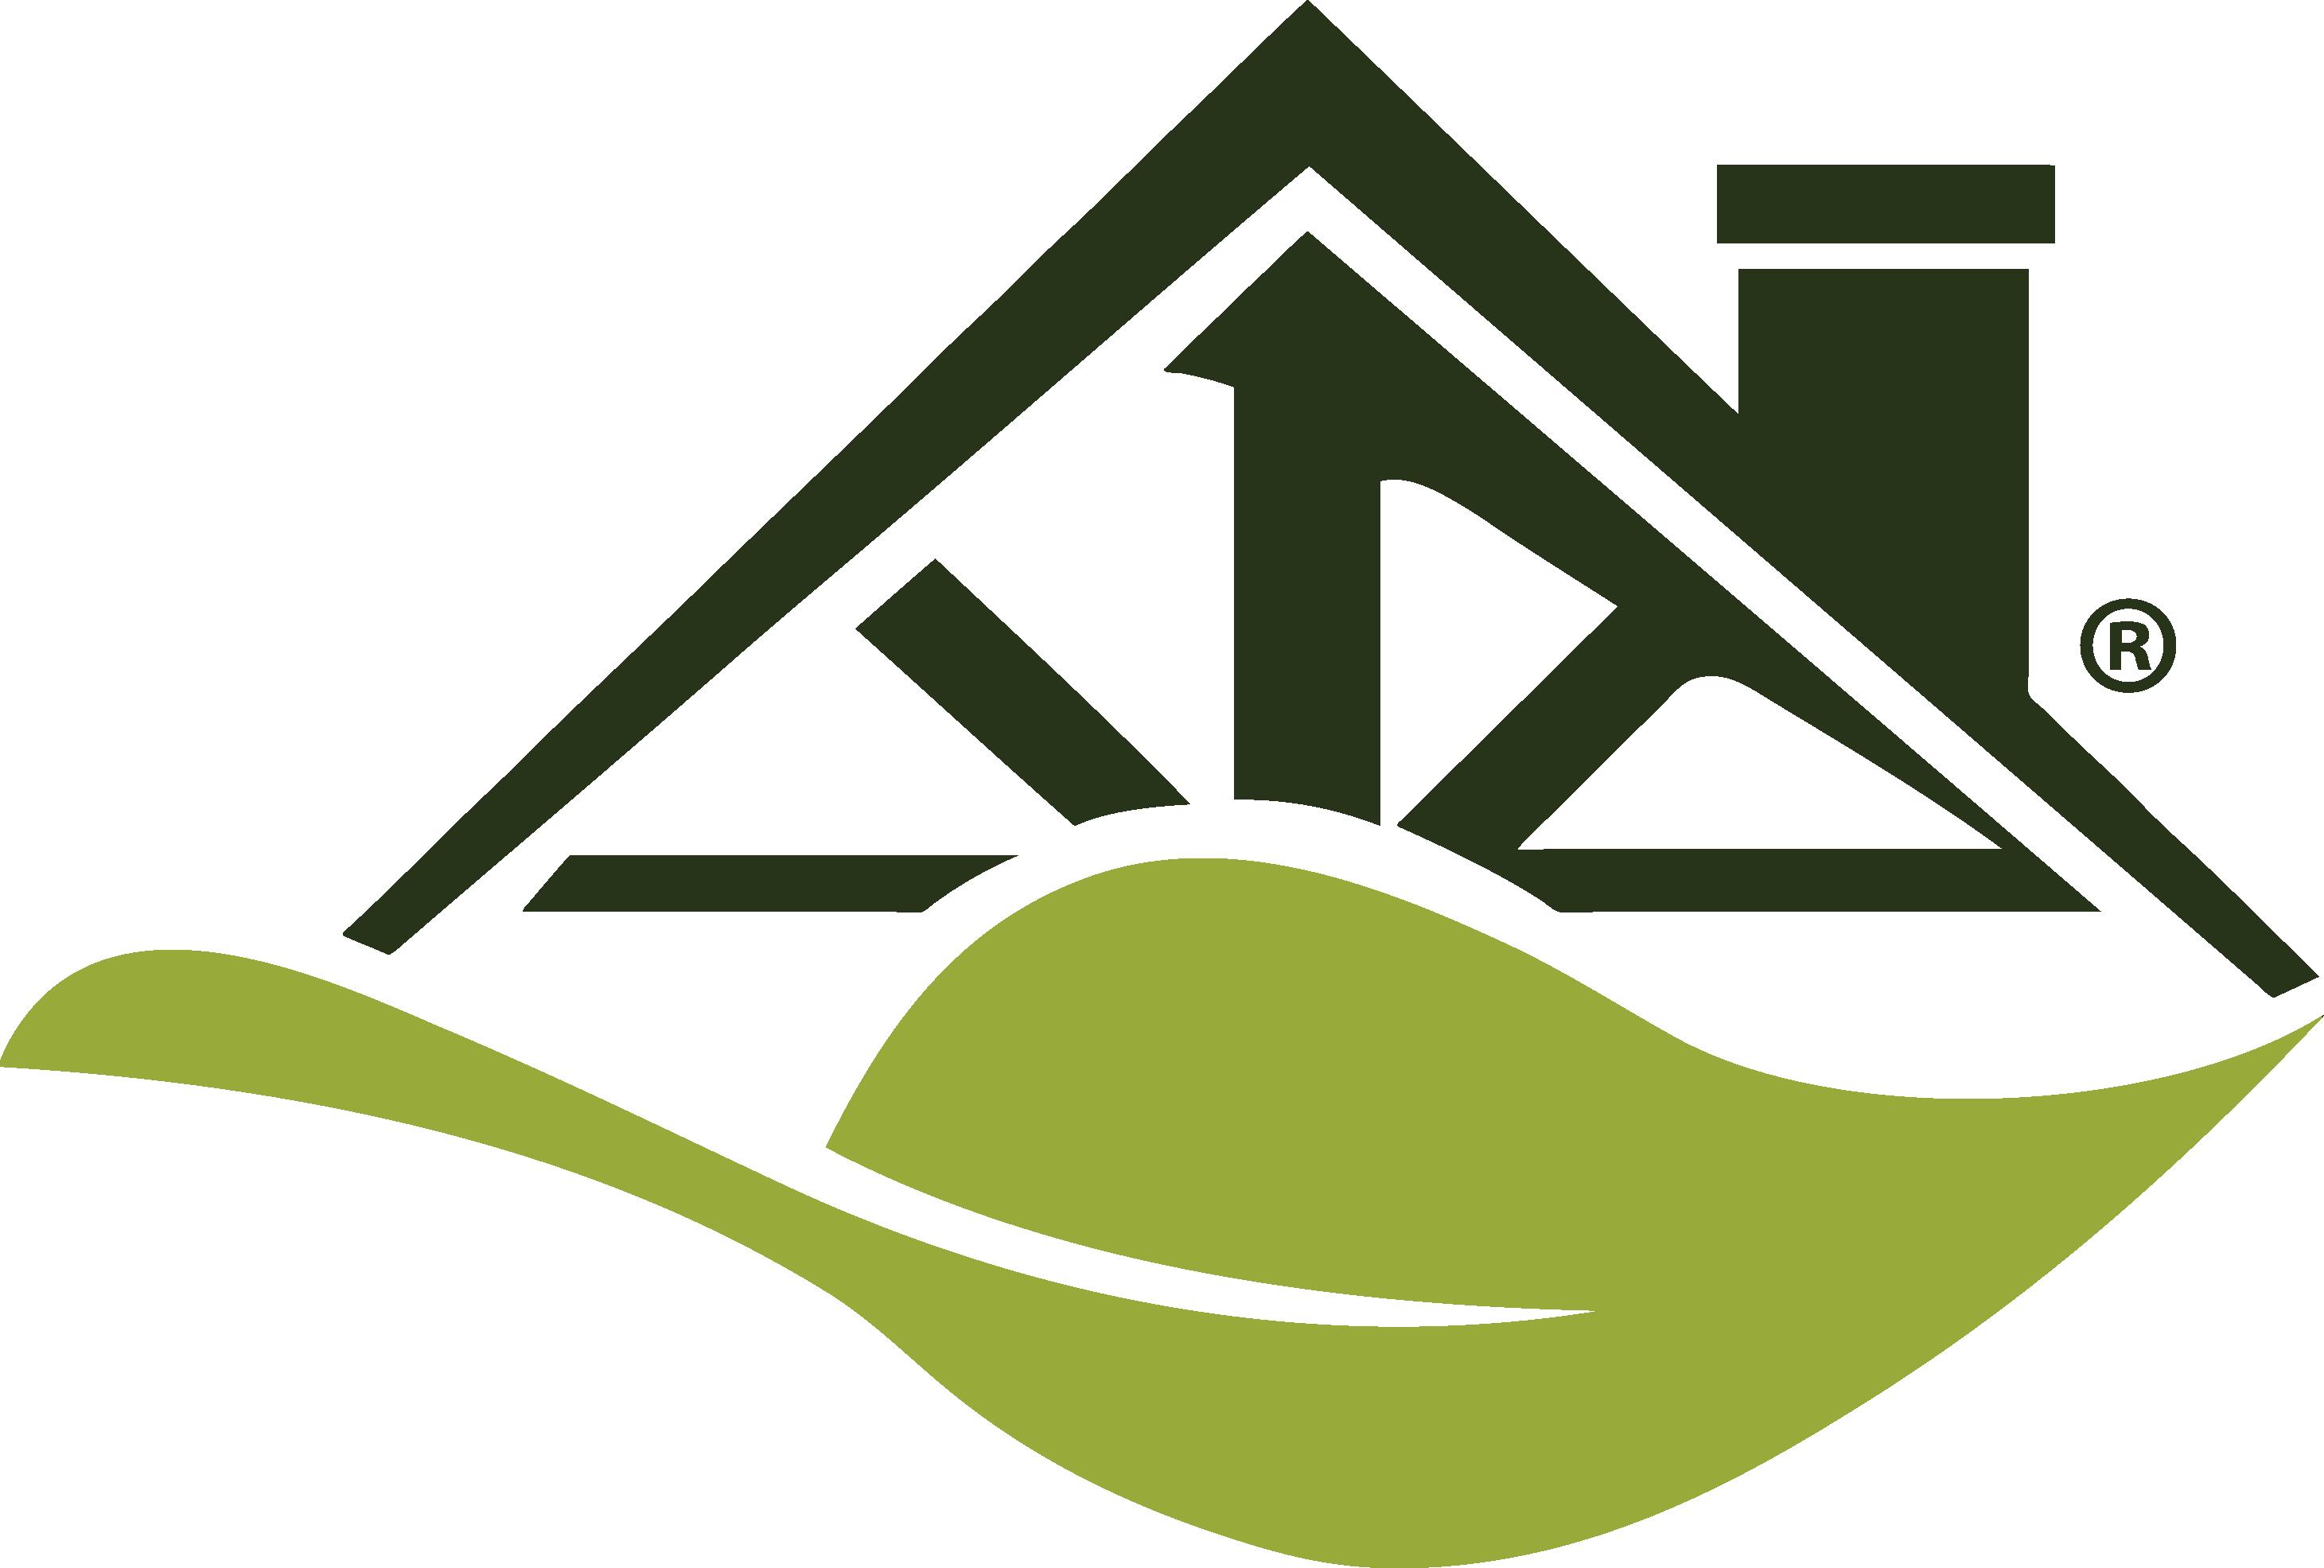 CRG-companies-symbol-trademark